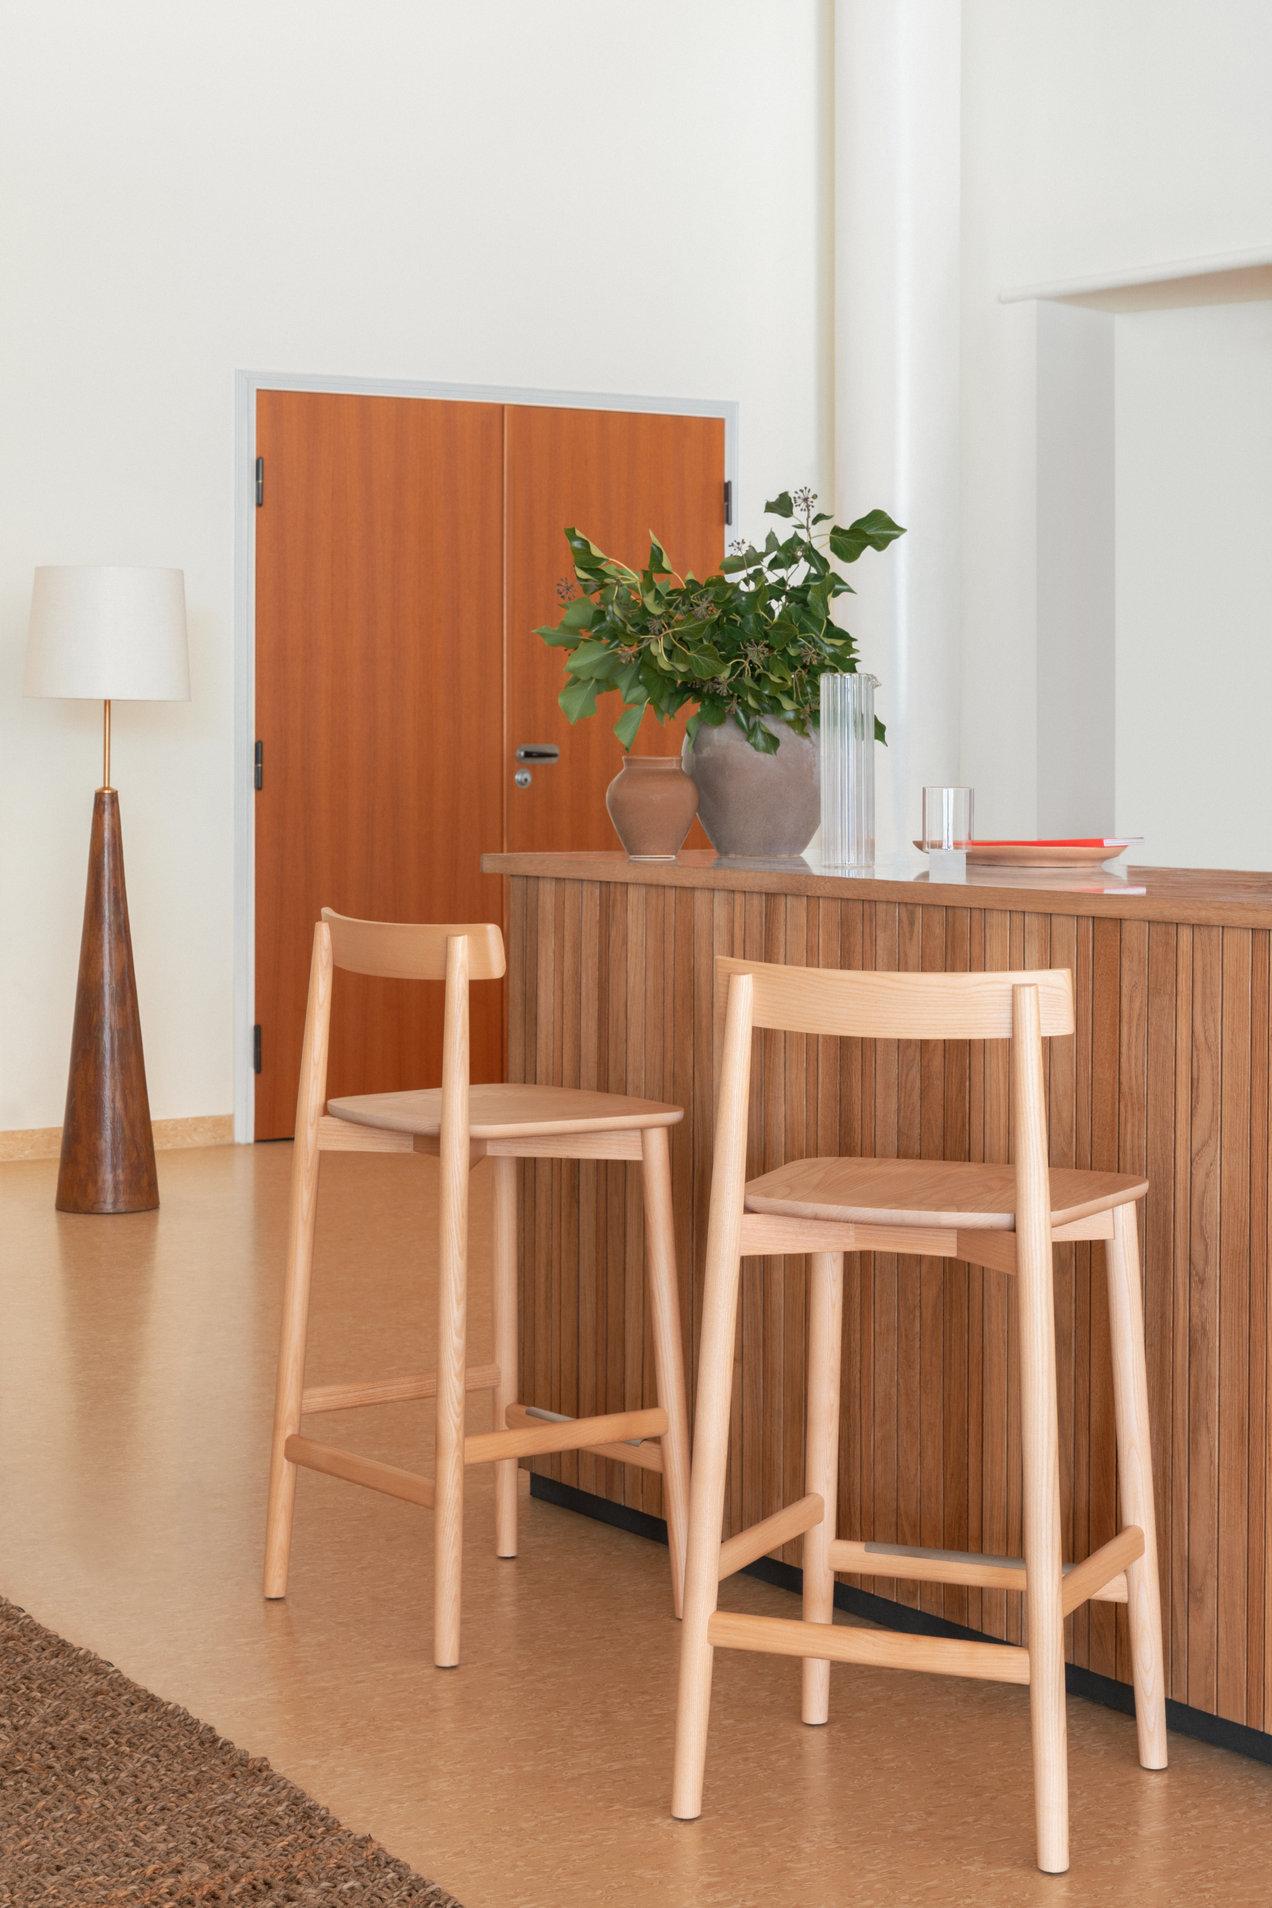 Lara--1793--counter-stool--gallerySlider-1--Ash--DM.png